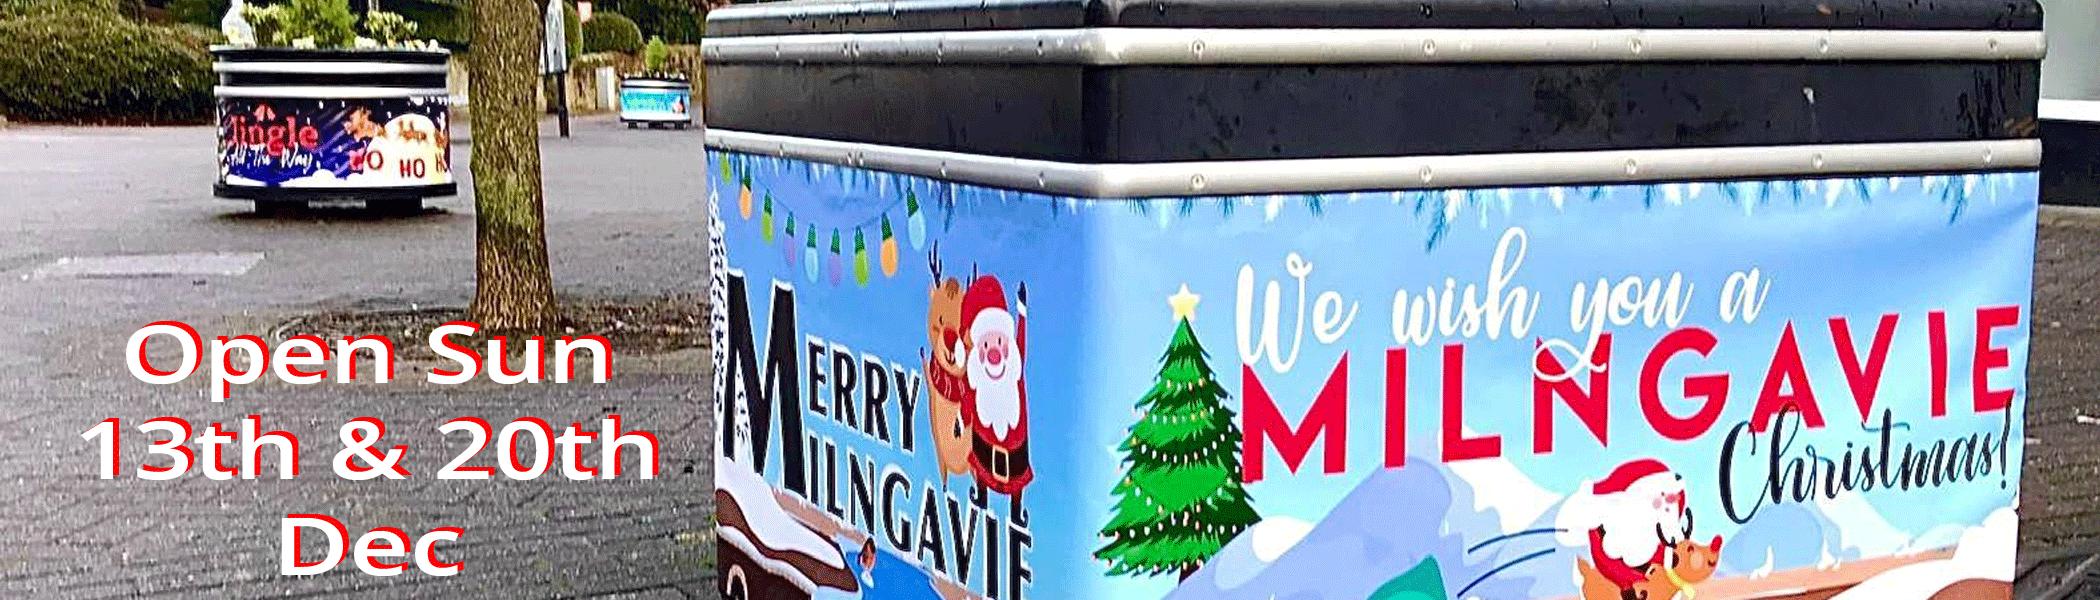 Milngavie Open Sun 13 and 20 Dec 2020